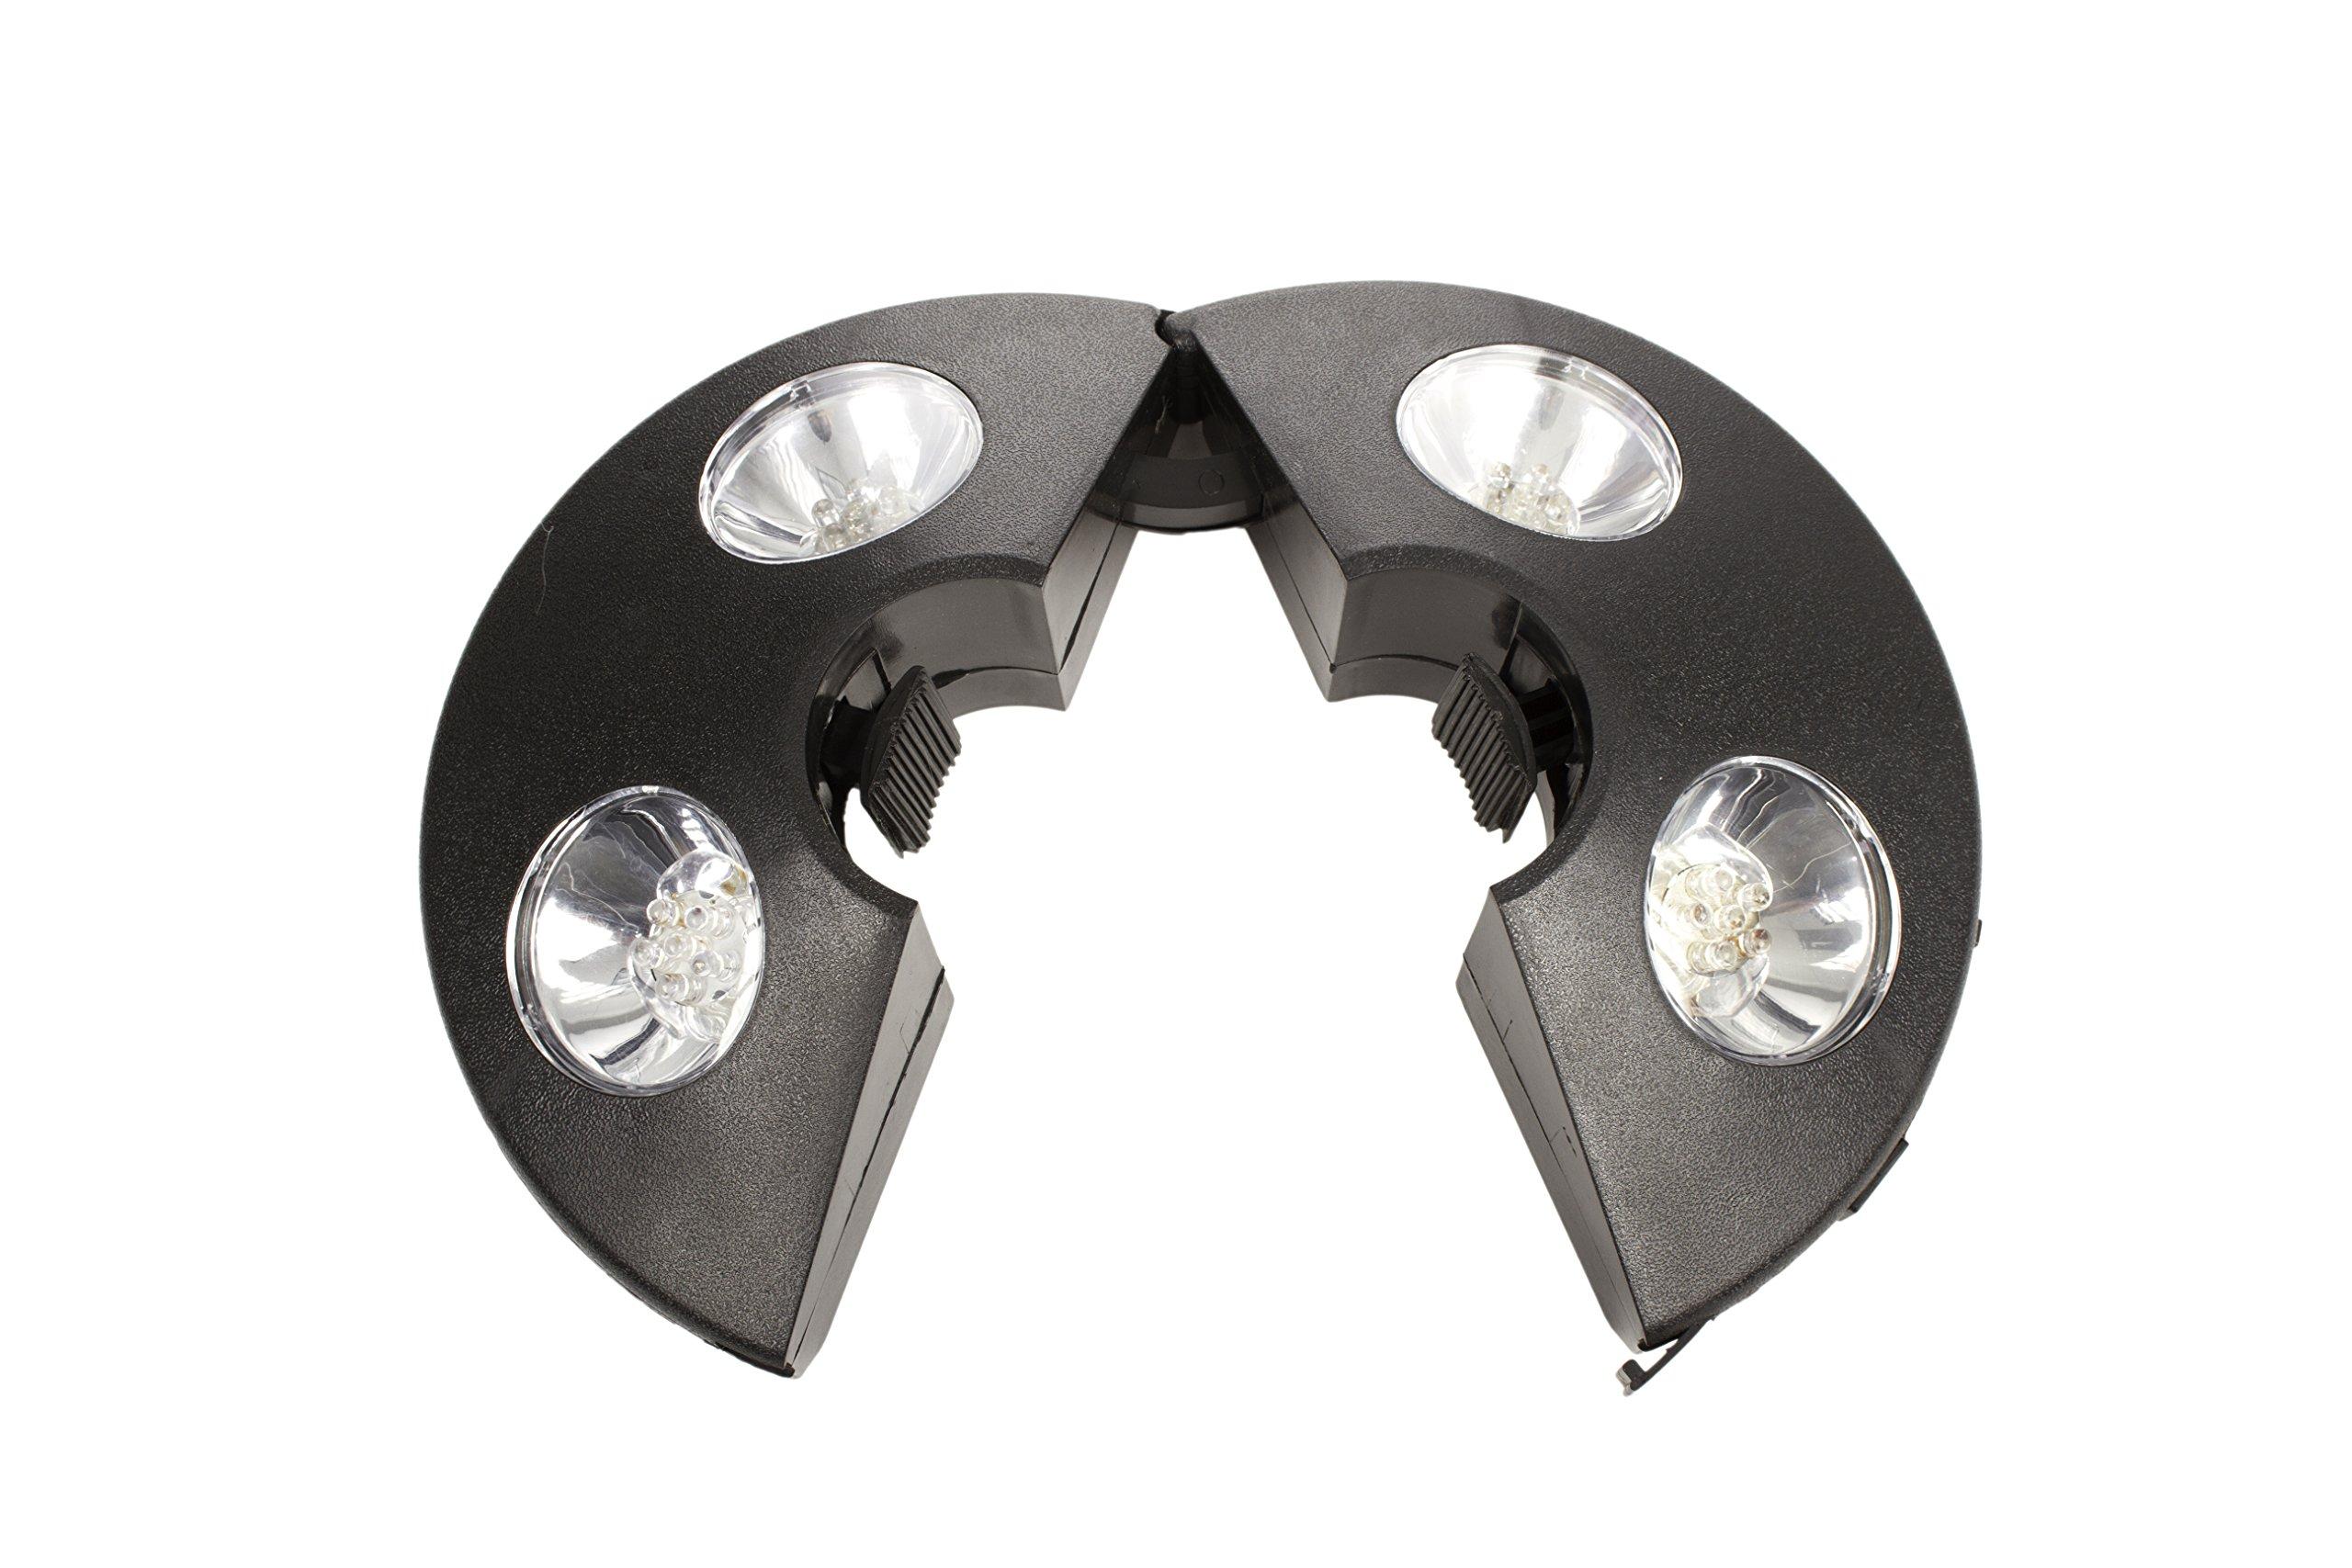 Umbrella Lights For Outdoor Patio Area - 24 LED Lights Cordless Tent Lantern - Parasol Lights